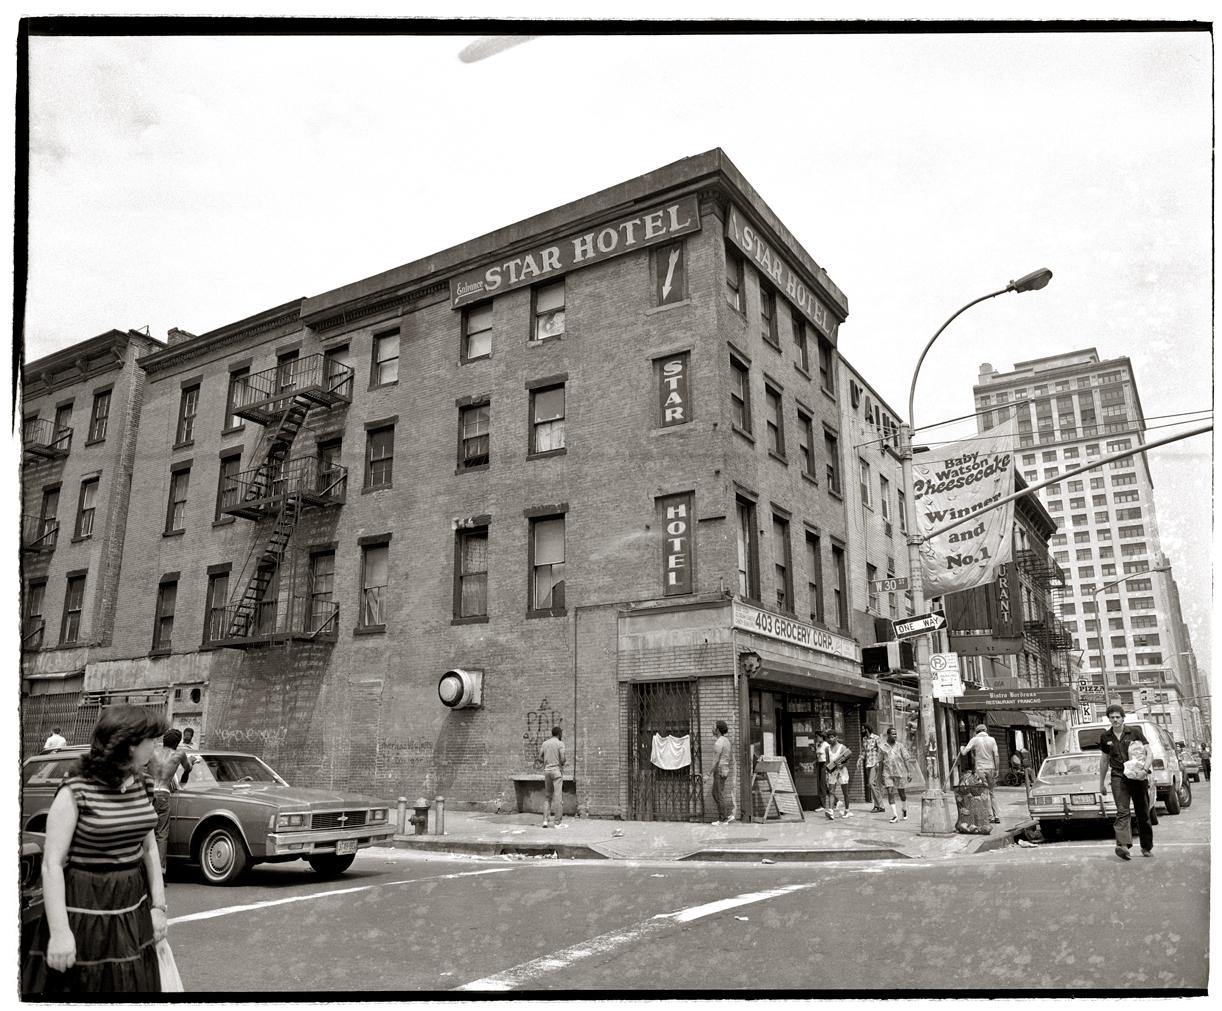 Star-Hotel-nyc-1986 copy